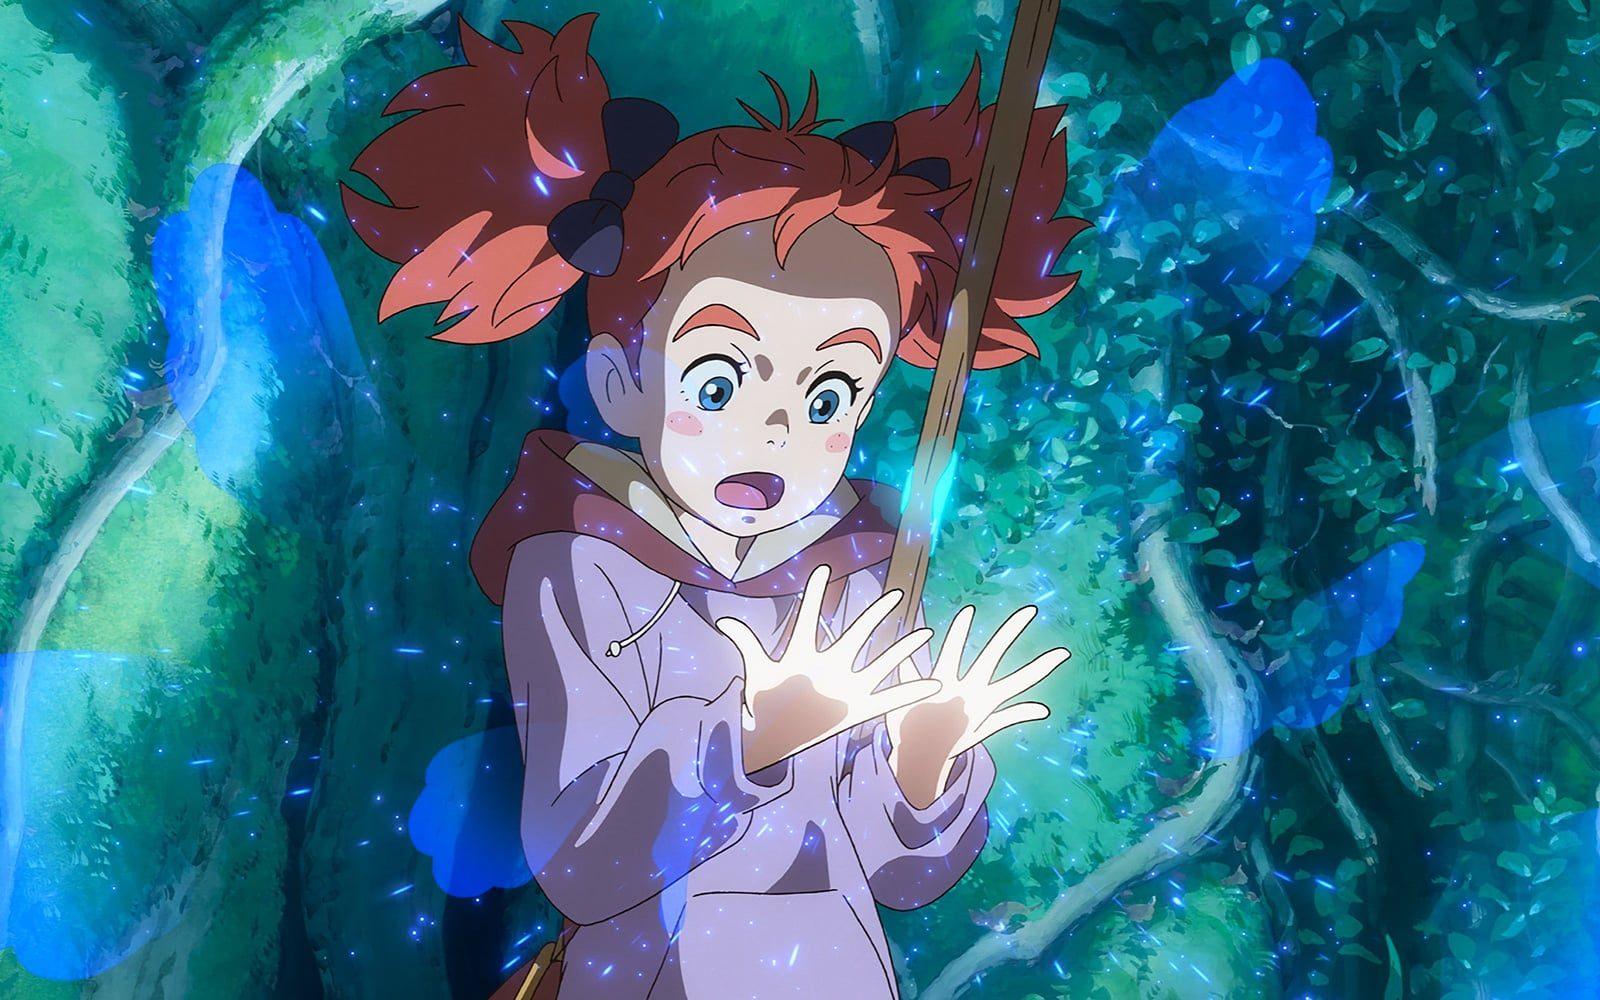 Mary and the Witch's Flower - Hiromasa Yonebayashi